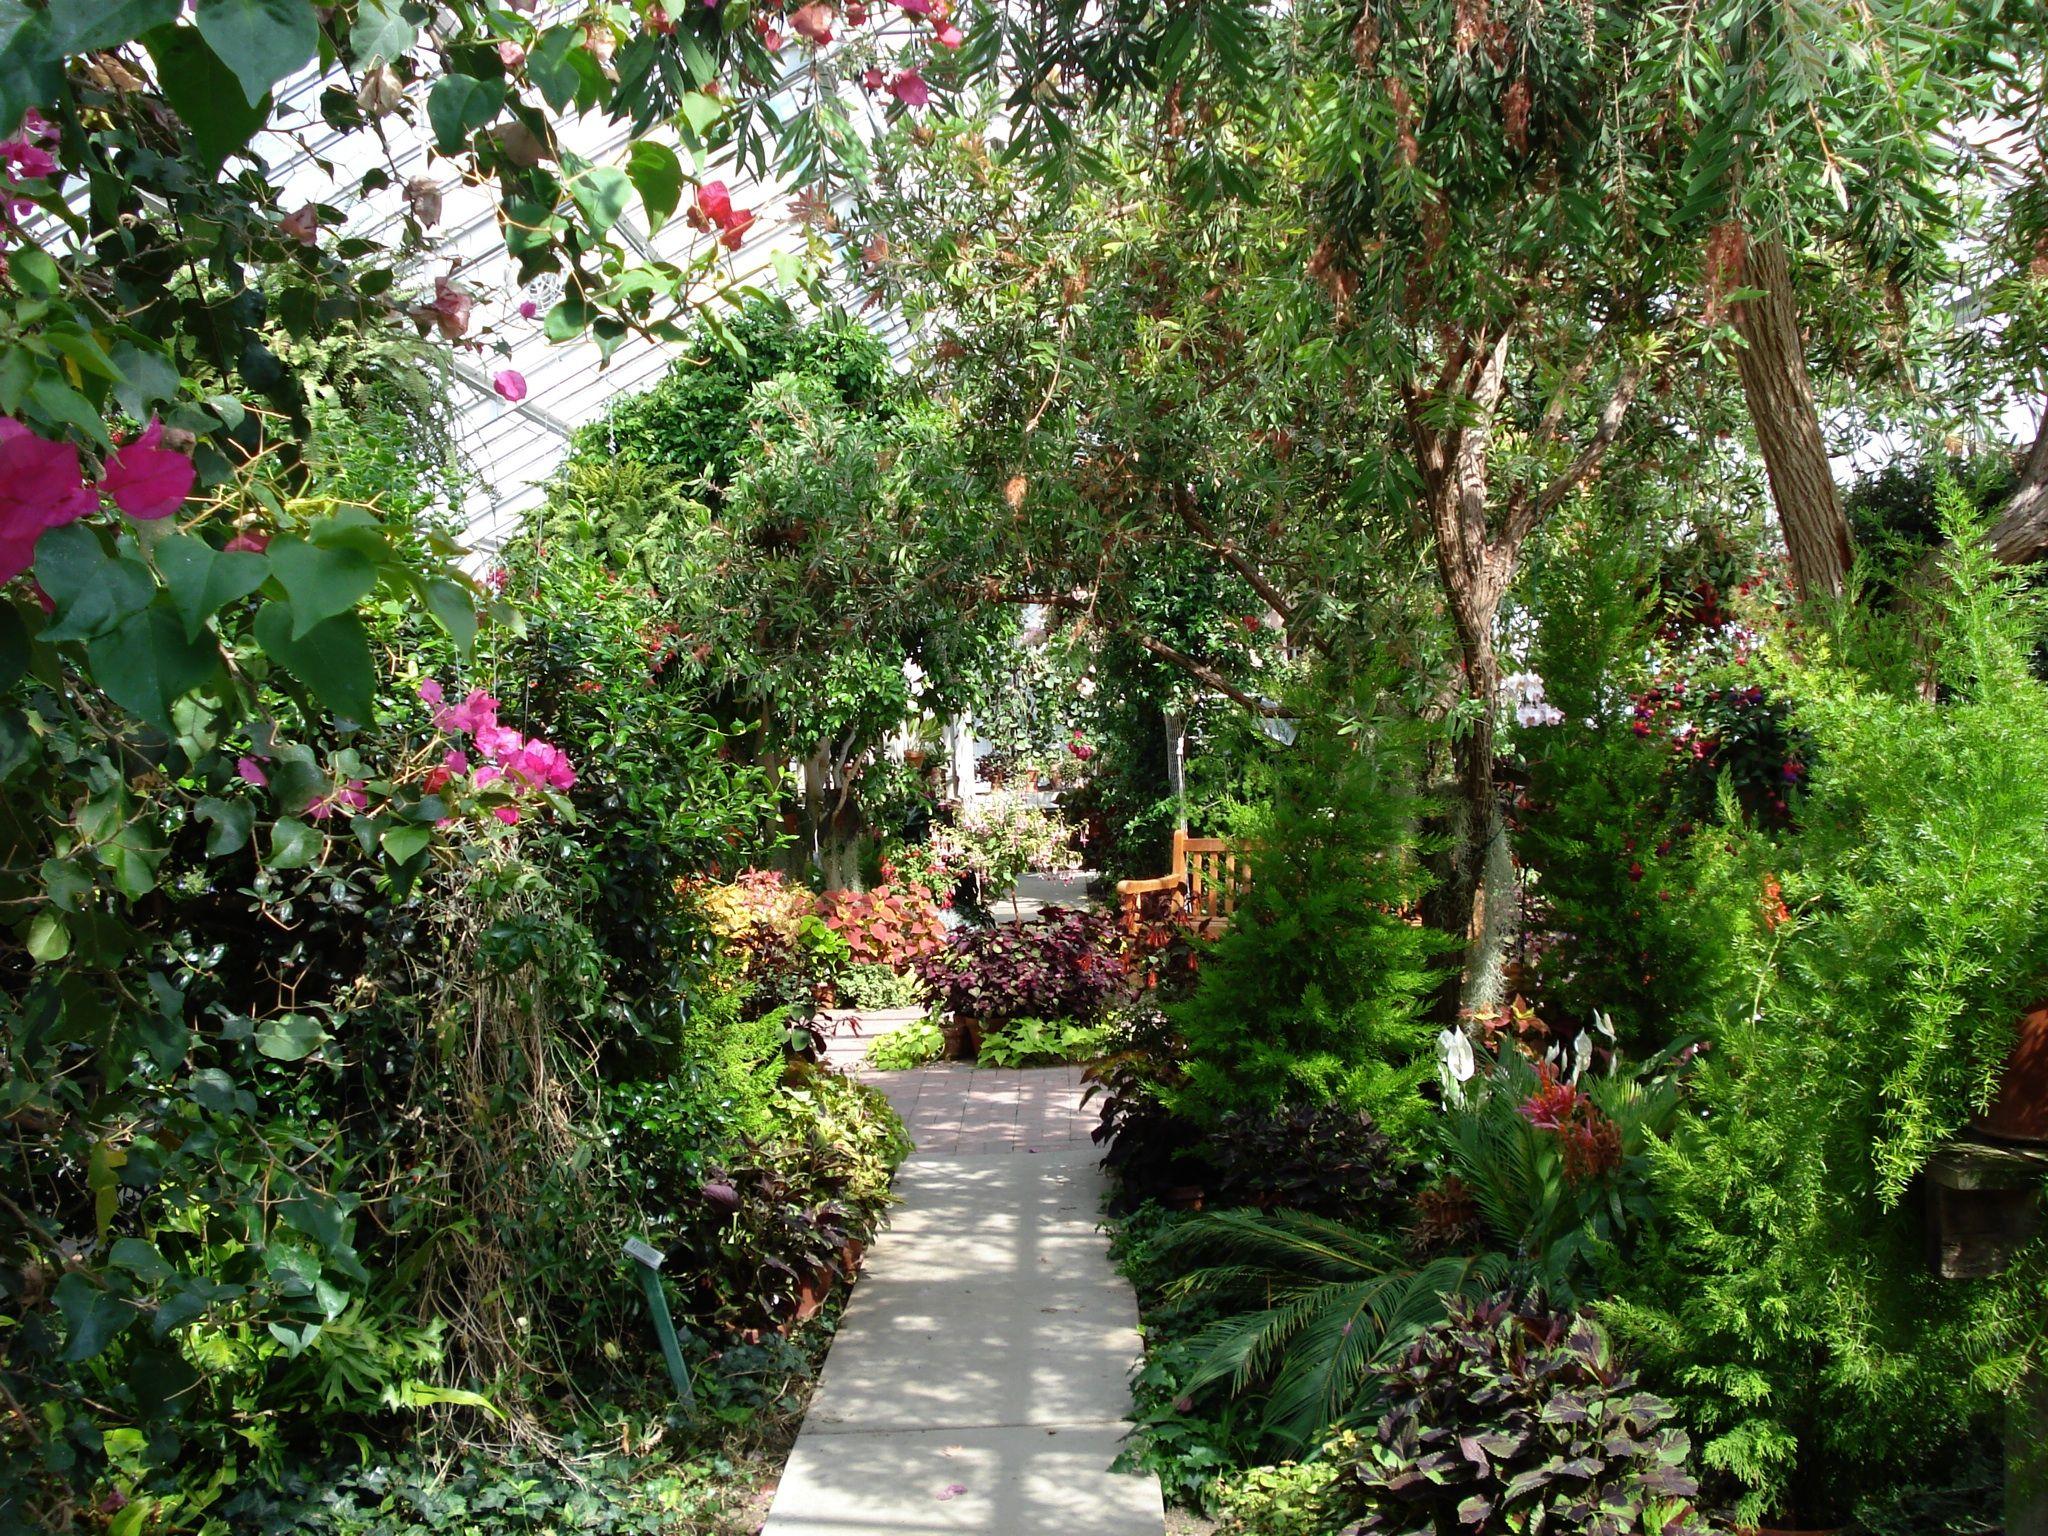 bb51815486ae4c49254f787669d8bd32 - Hidden Lake Gardens In Tipton Michigan